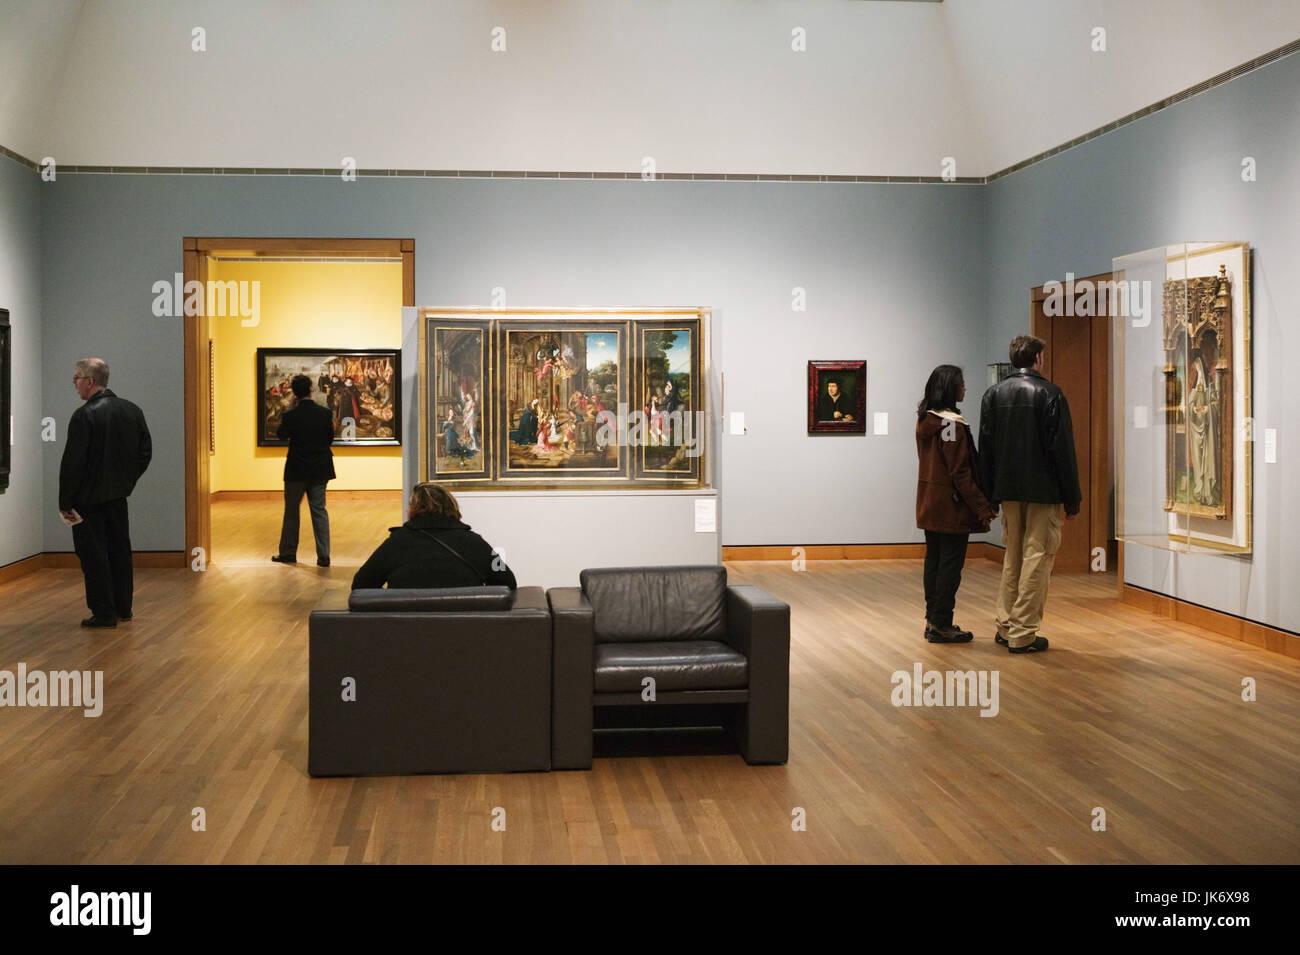 Kanada, Quebec, Montreal, Museum of Fine Art, Ausstellung, Gemälde, Besucherausweis kein Model release, Nordamerika, Stockbild